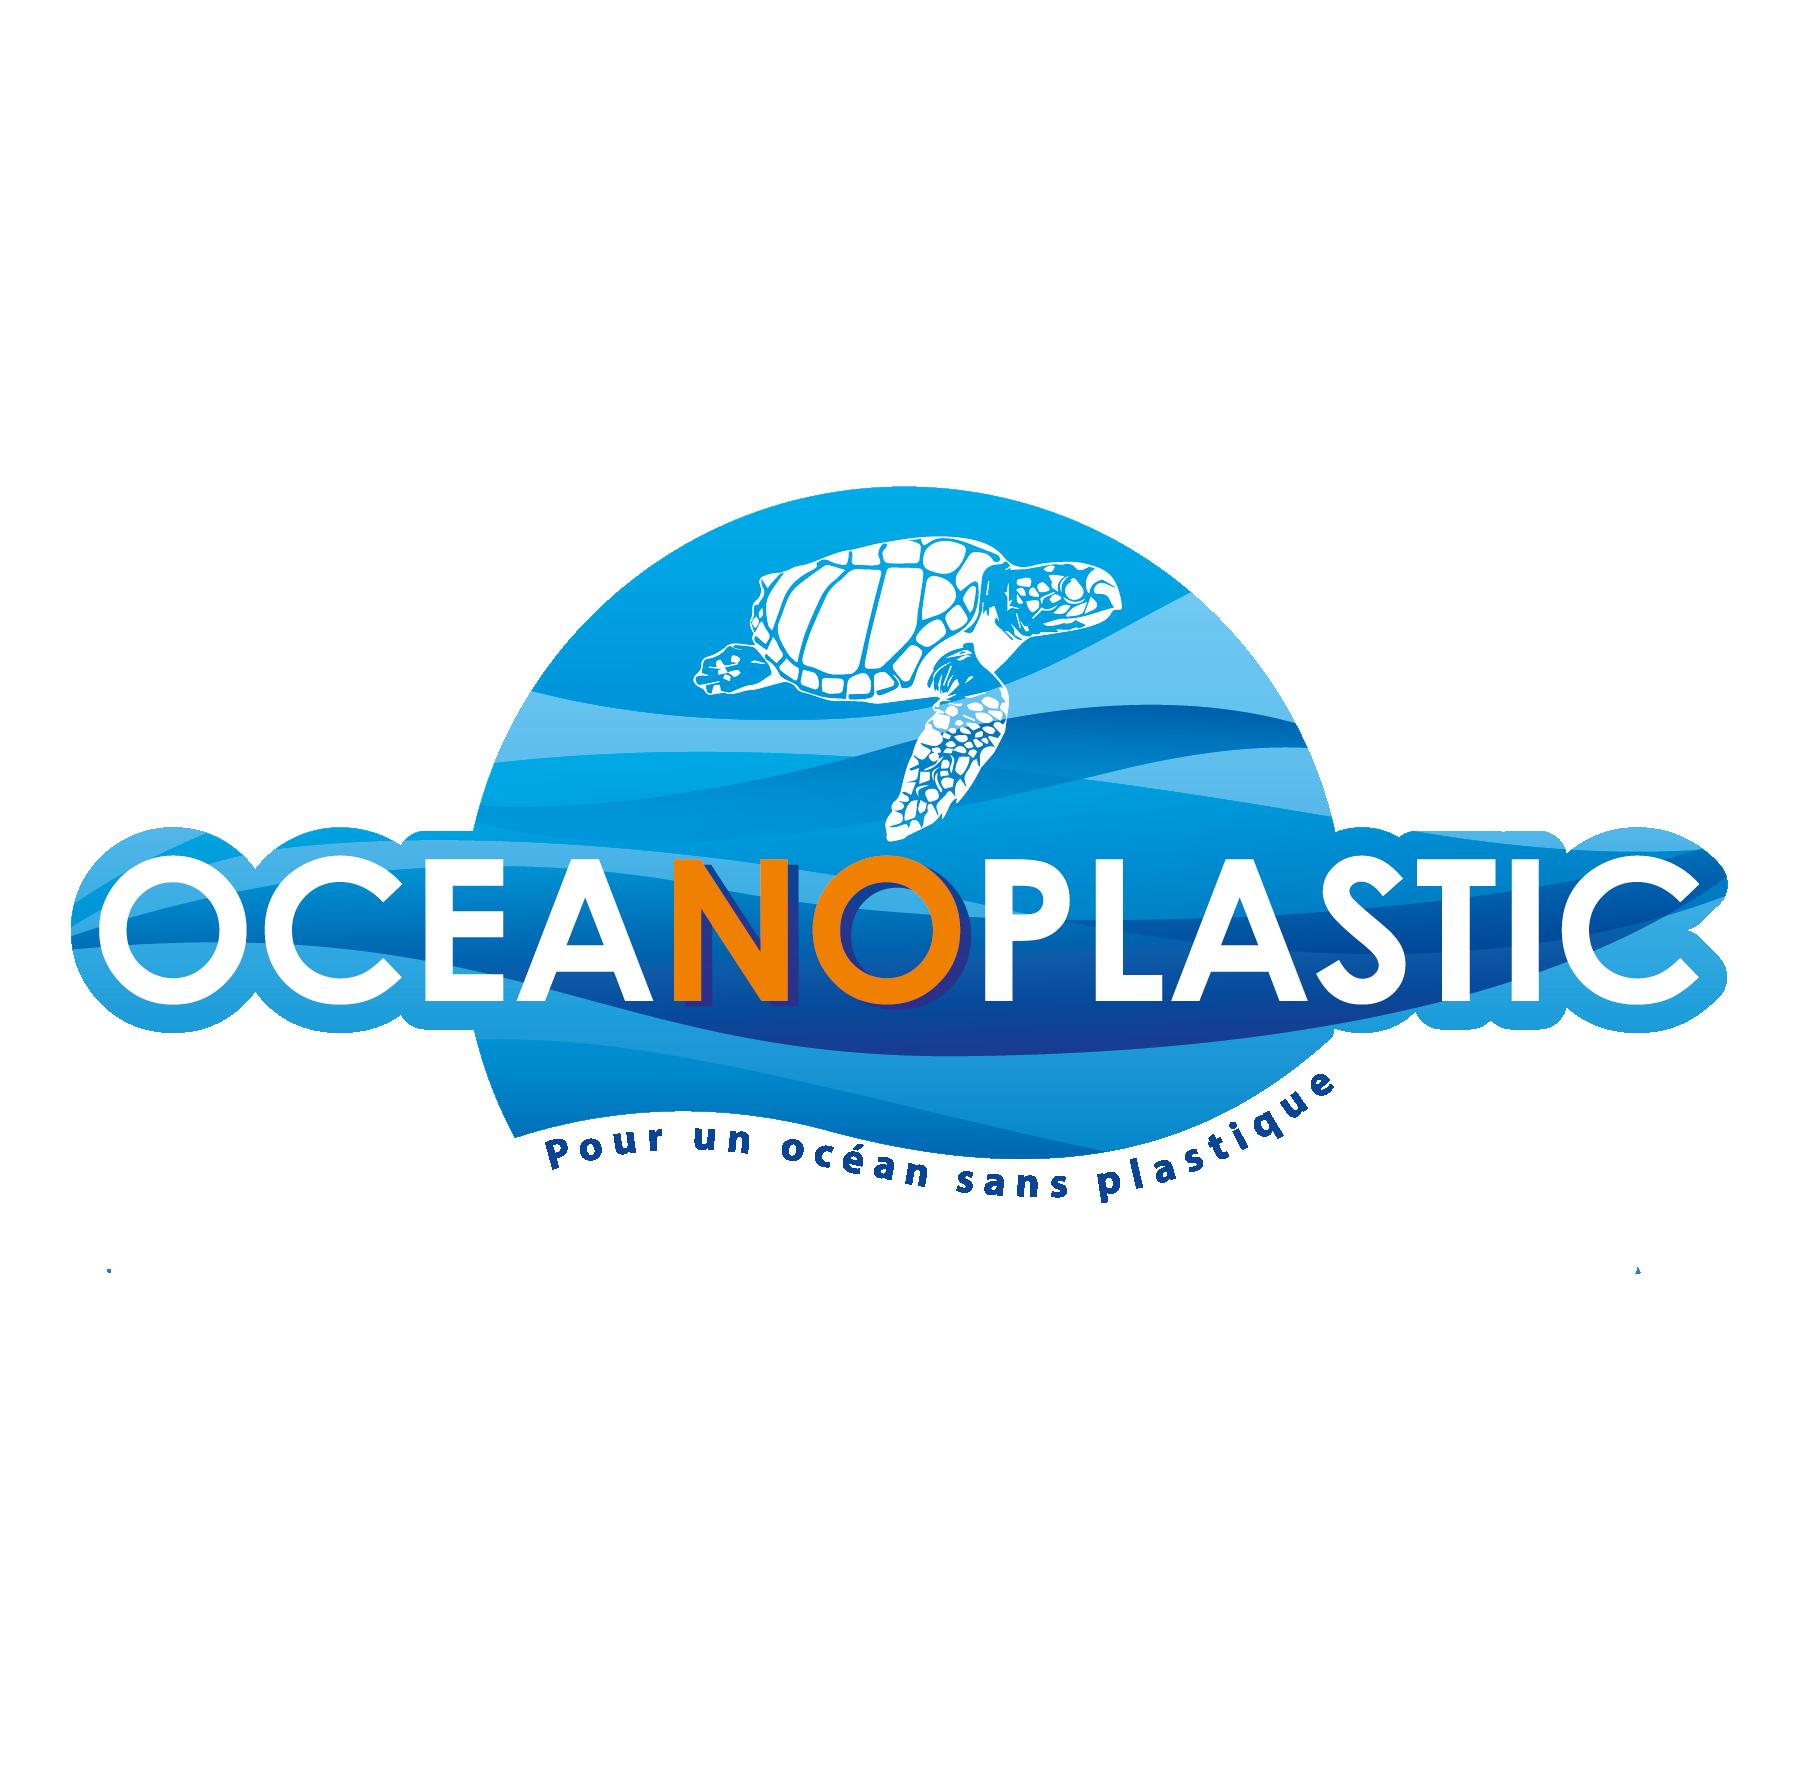 OCEANOPLASTIC